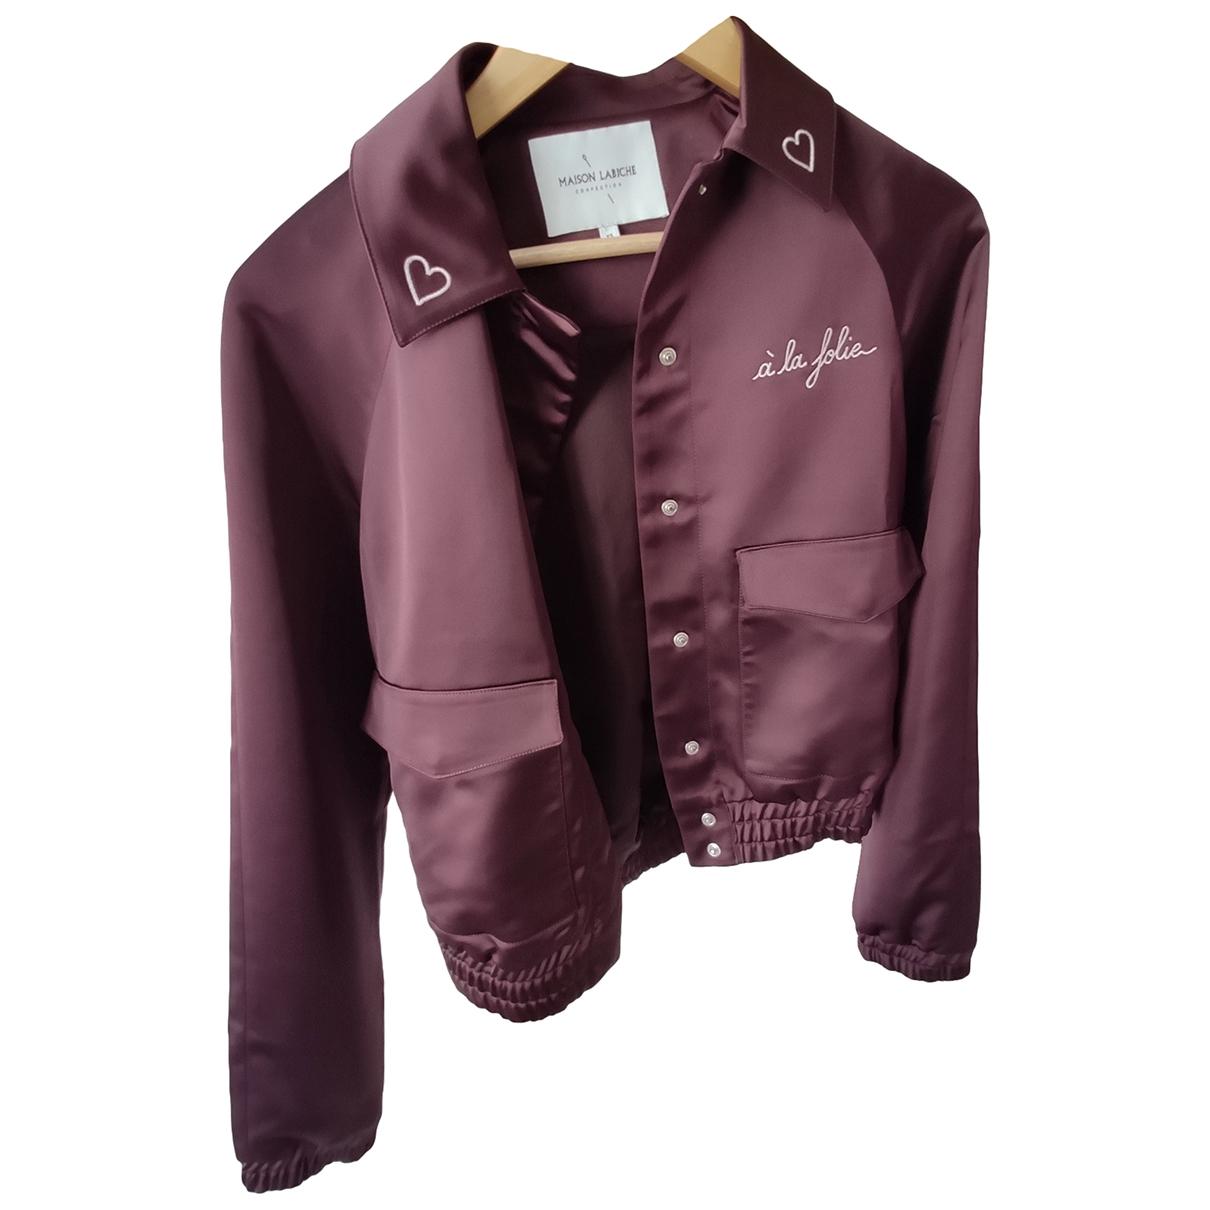 Maison Labiche \N Brown jacket for Women 34 FR